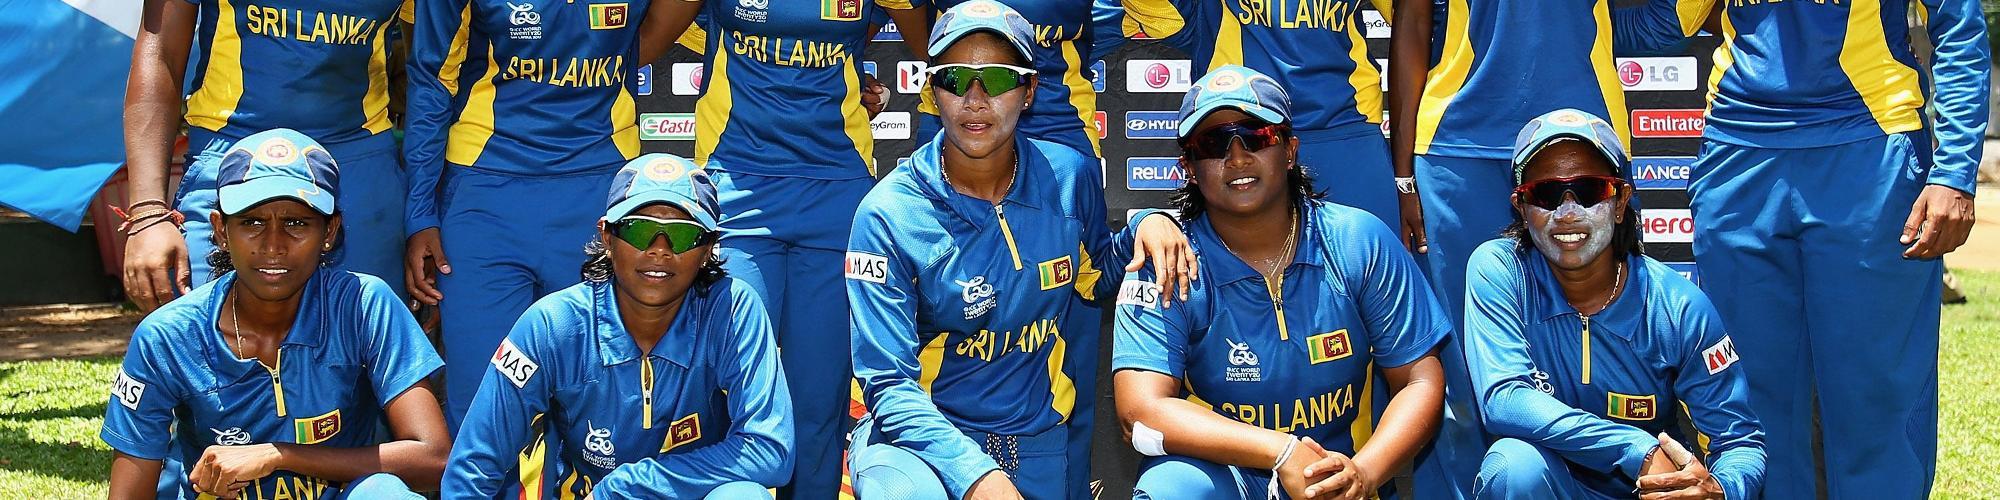 Women-Sri Lanka.jpg